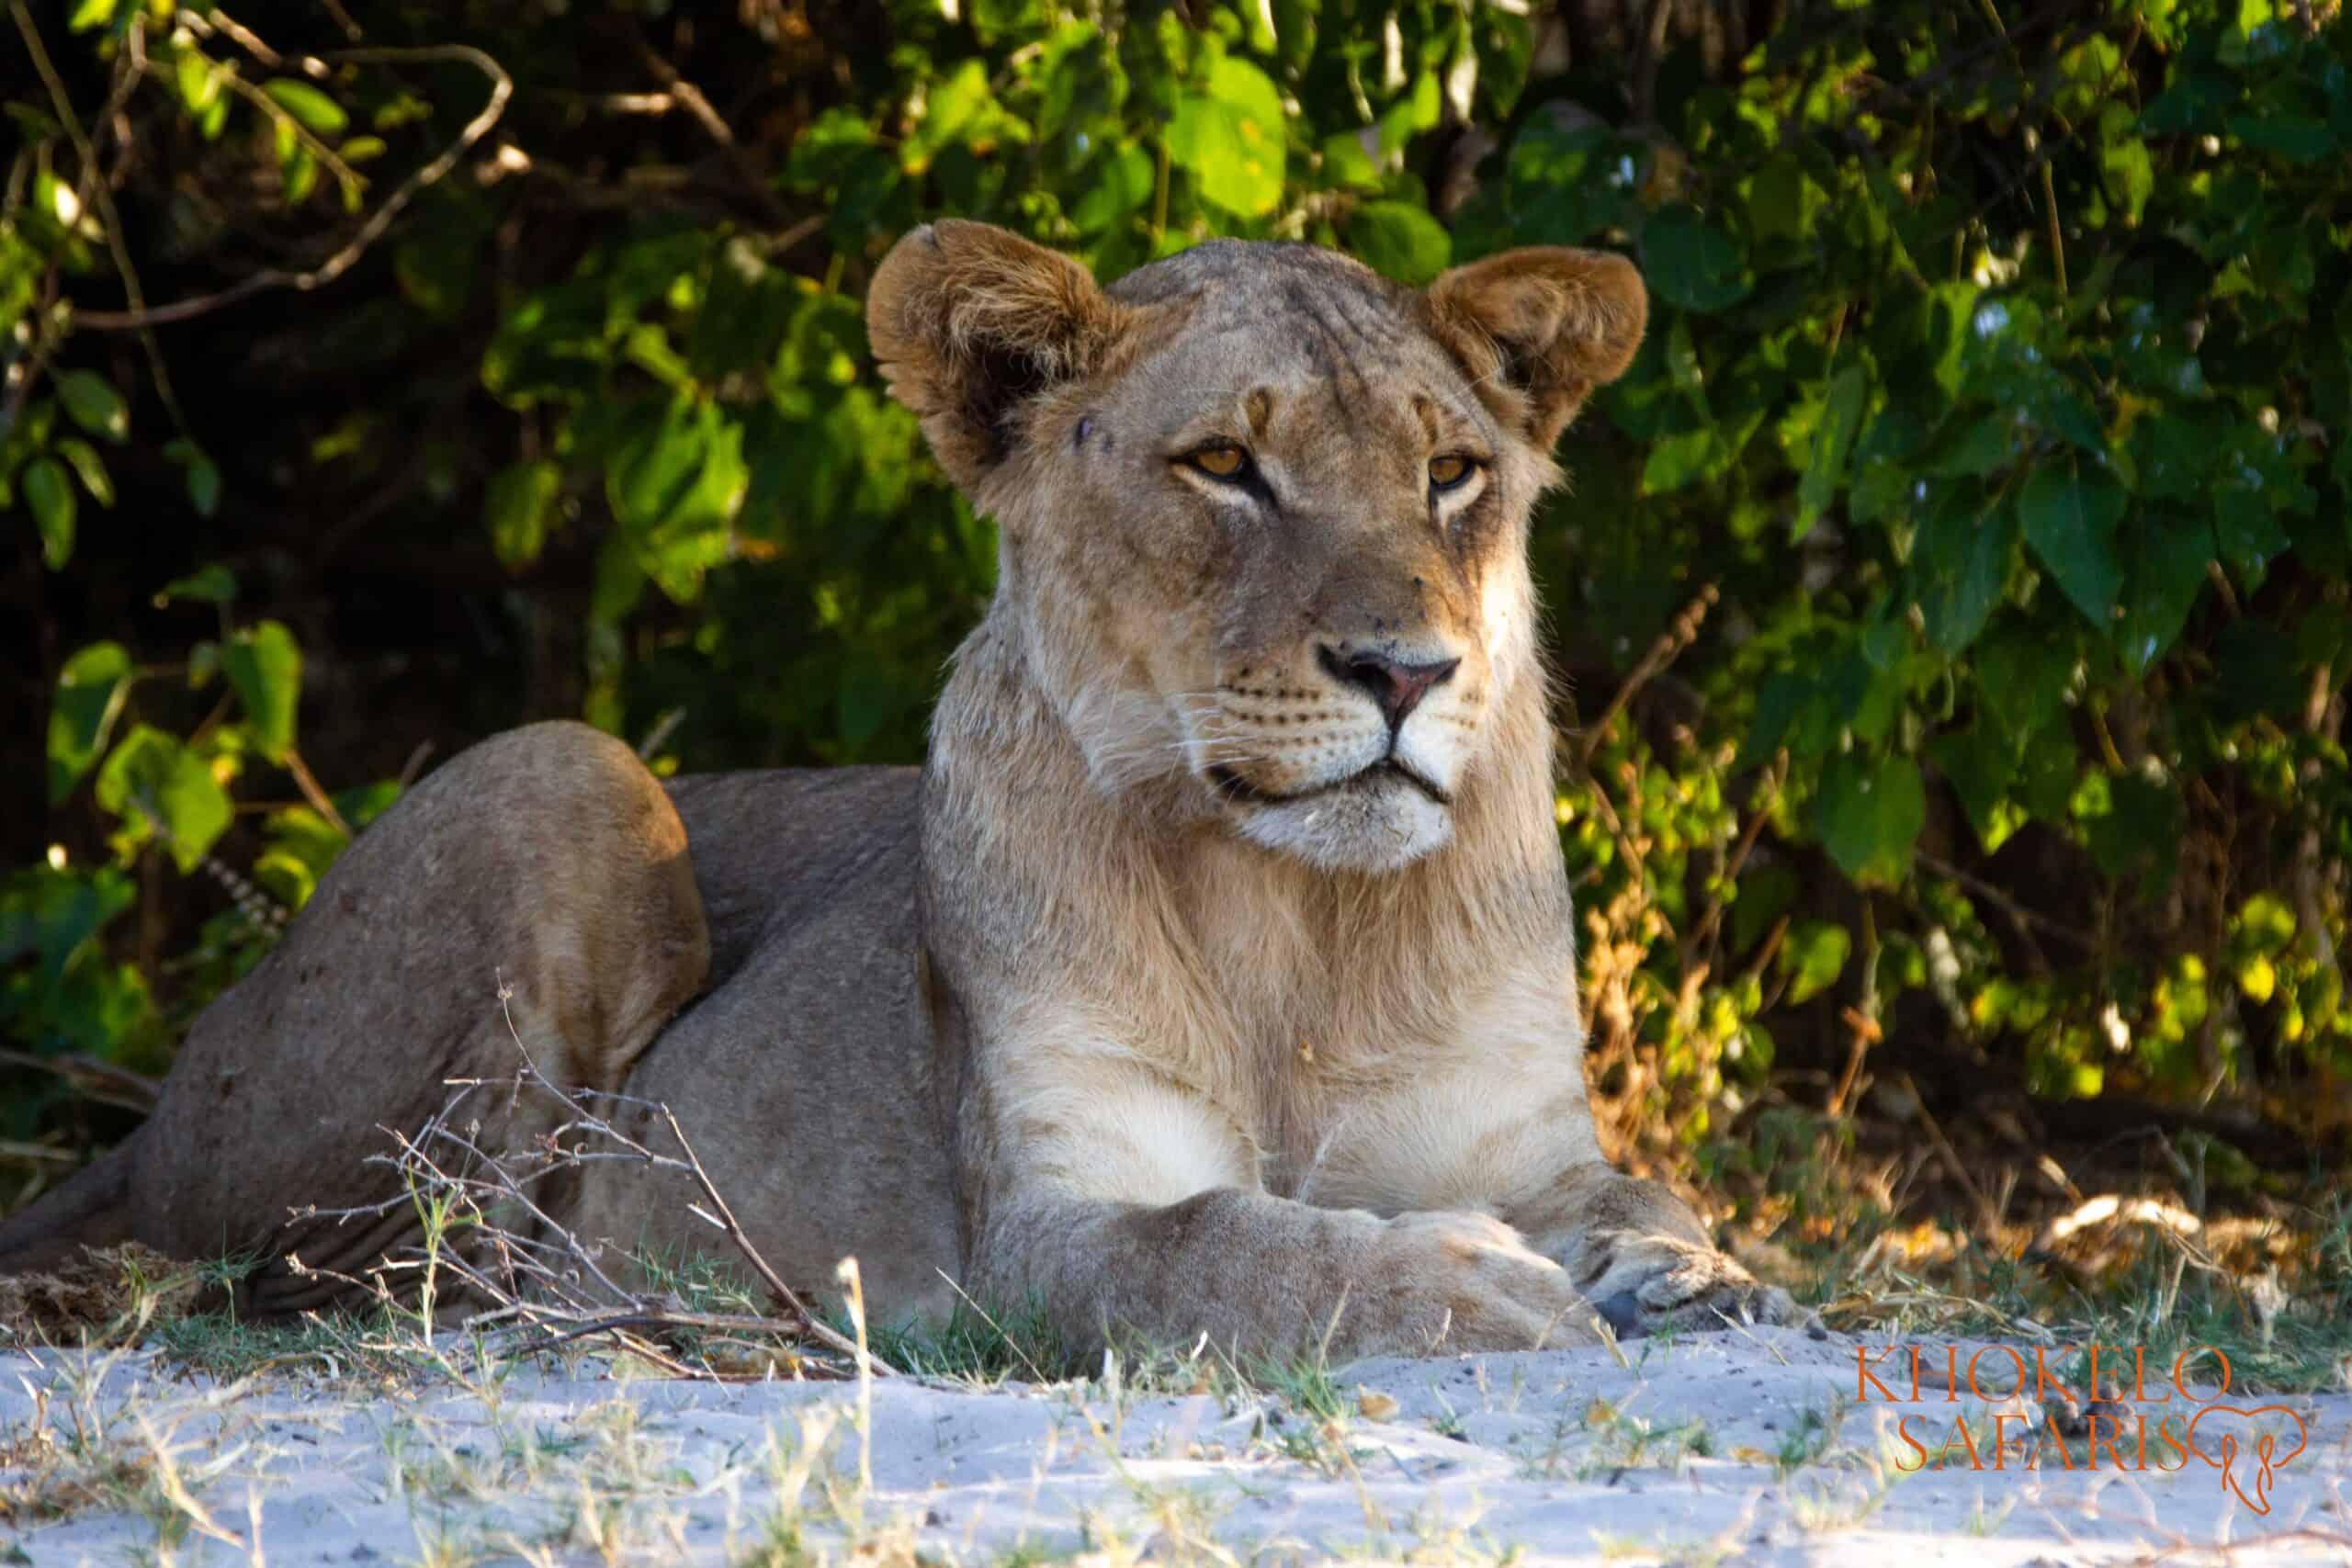 Safe travels in Botswana